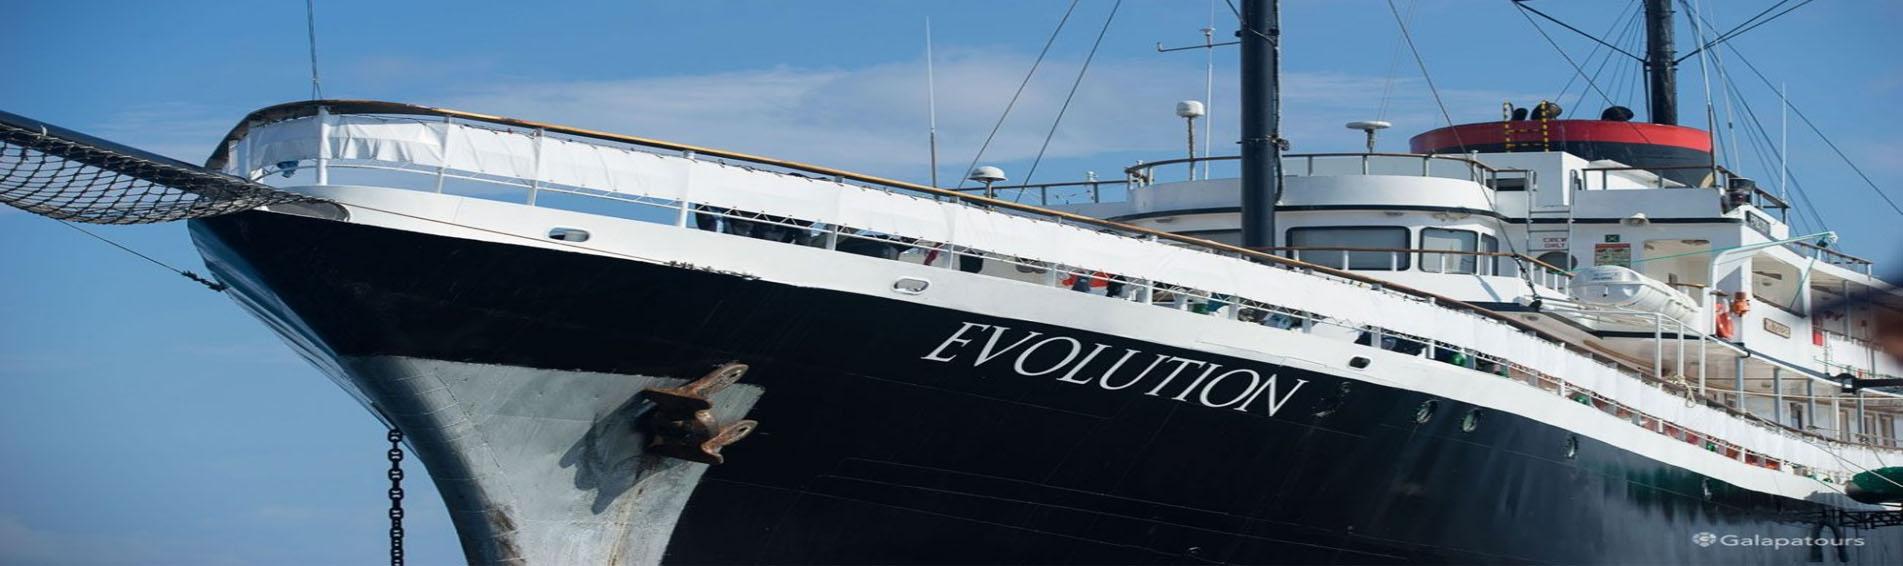 EVOLUTION Galapagos cruise slider